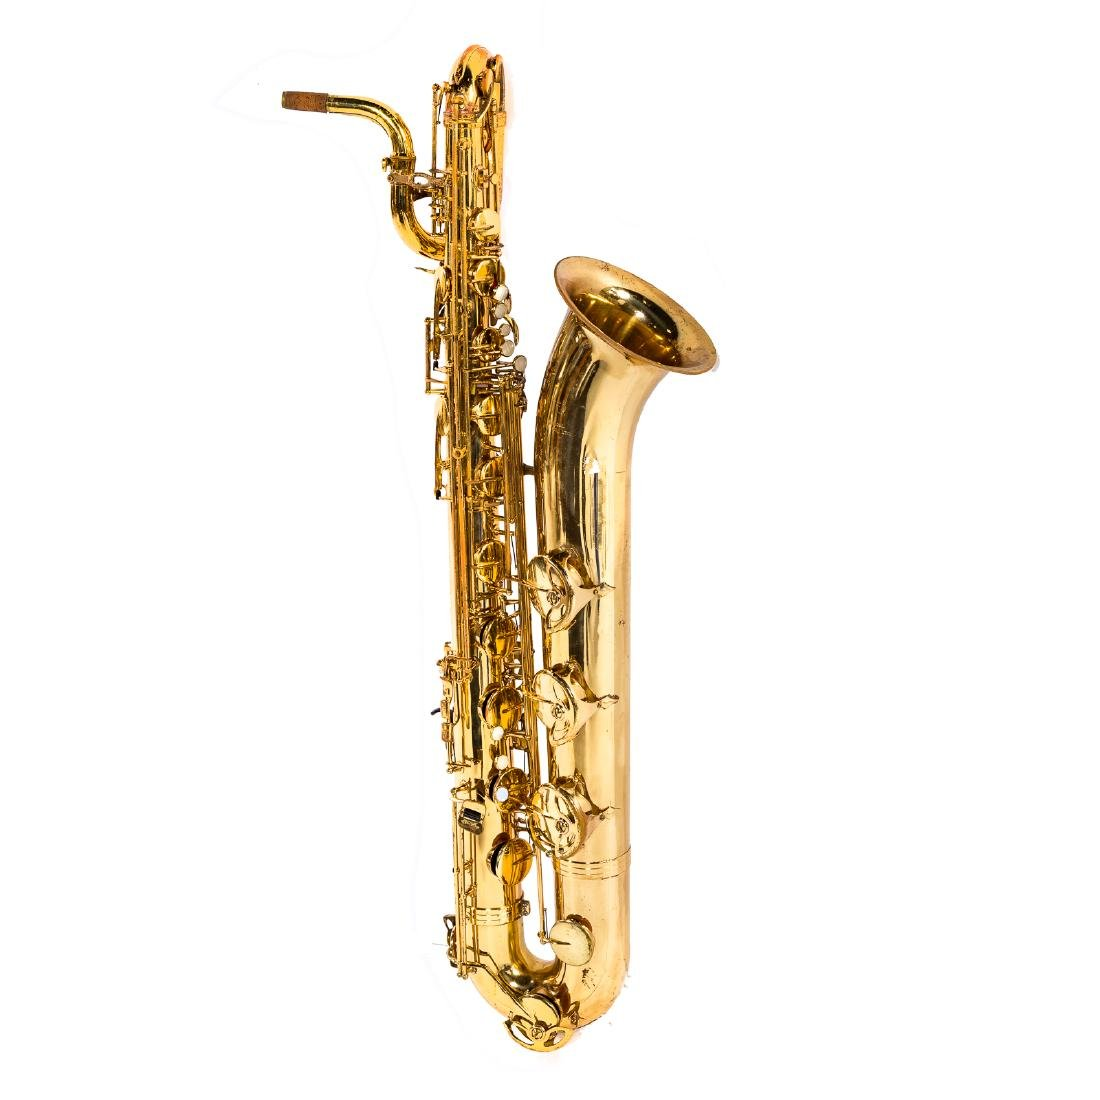 K.H.S. Jupiter alto saxophone